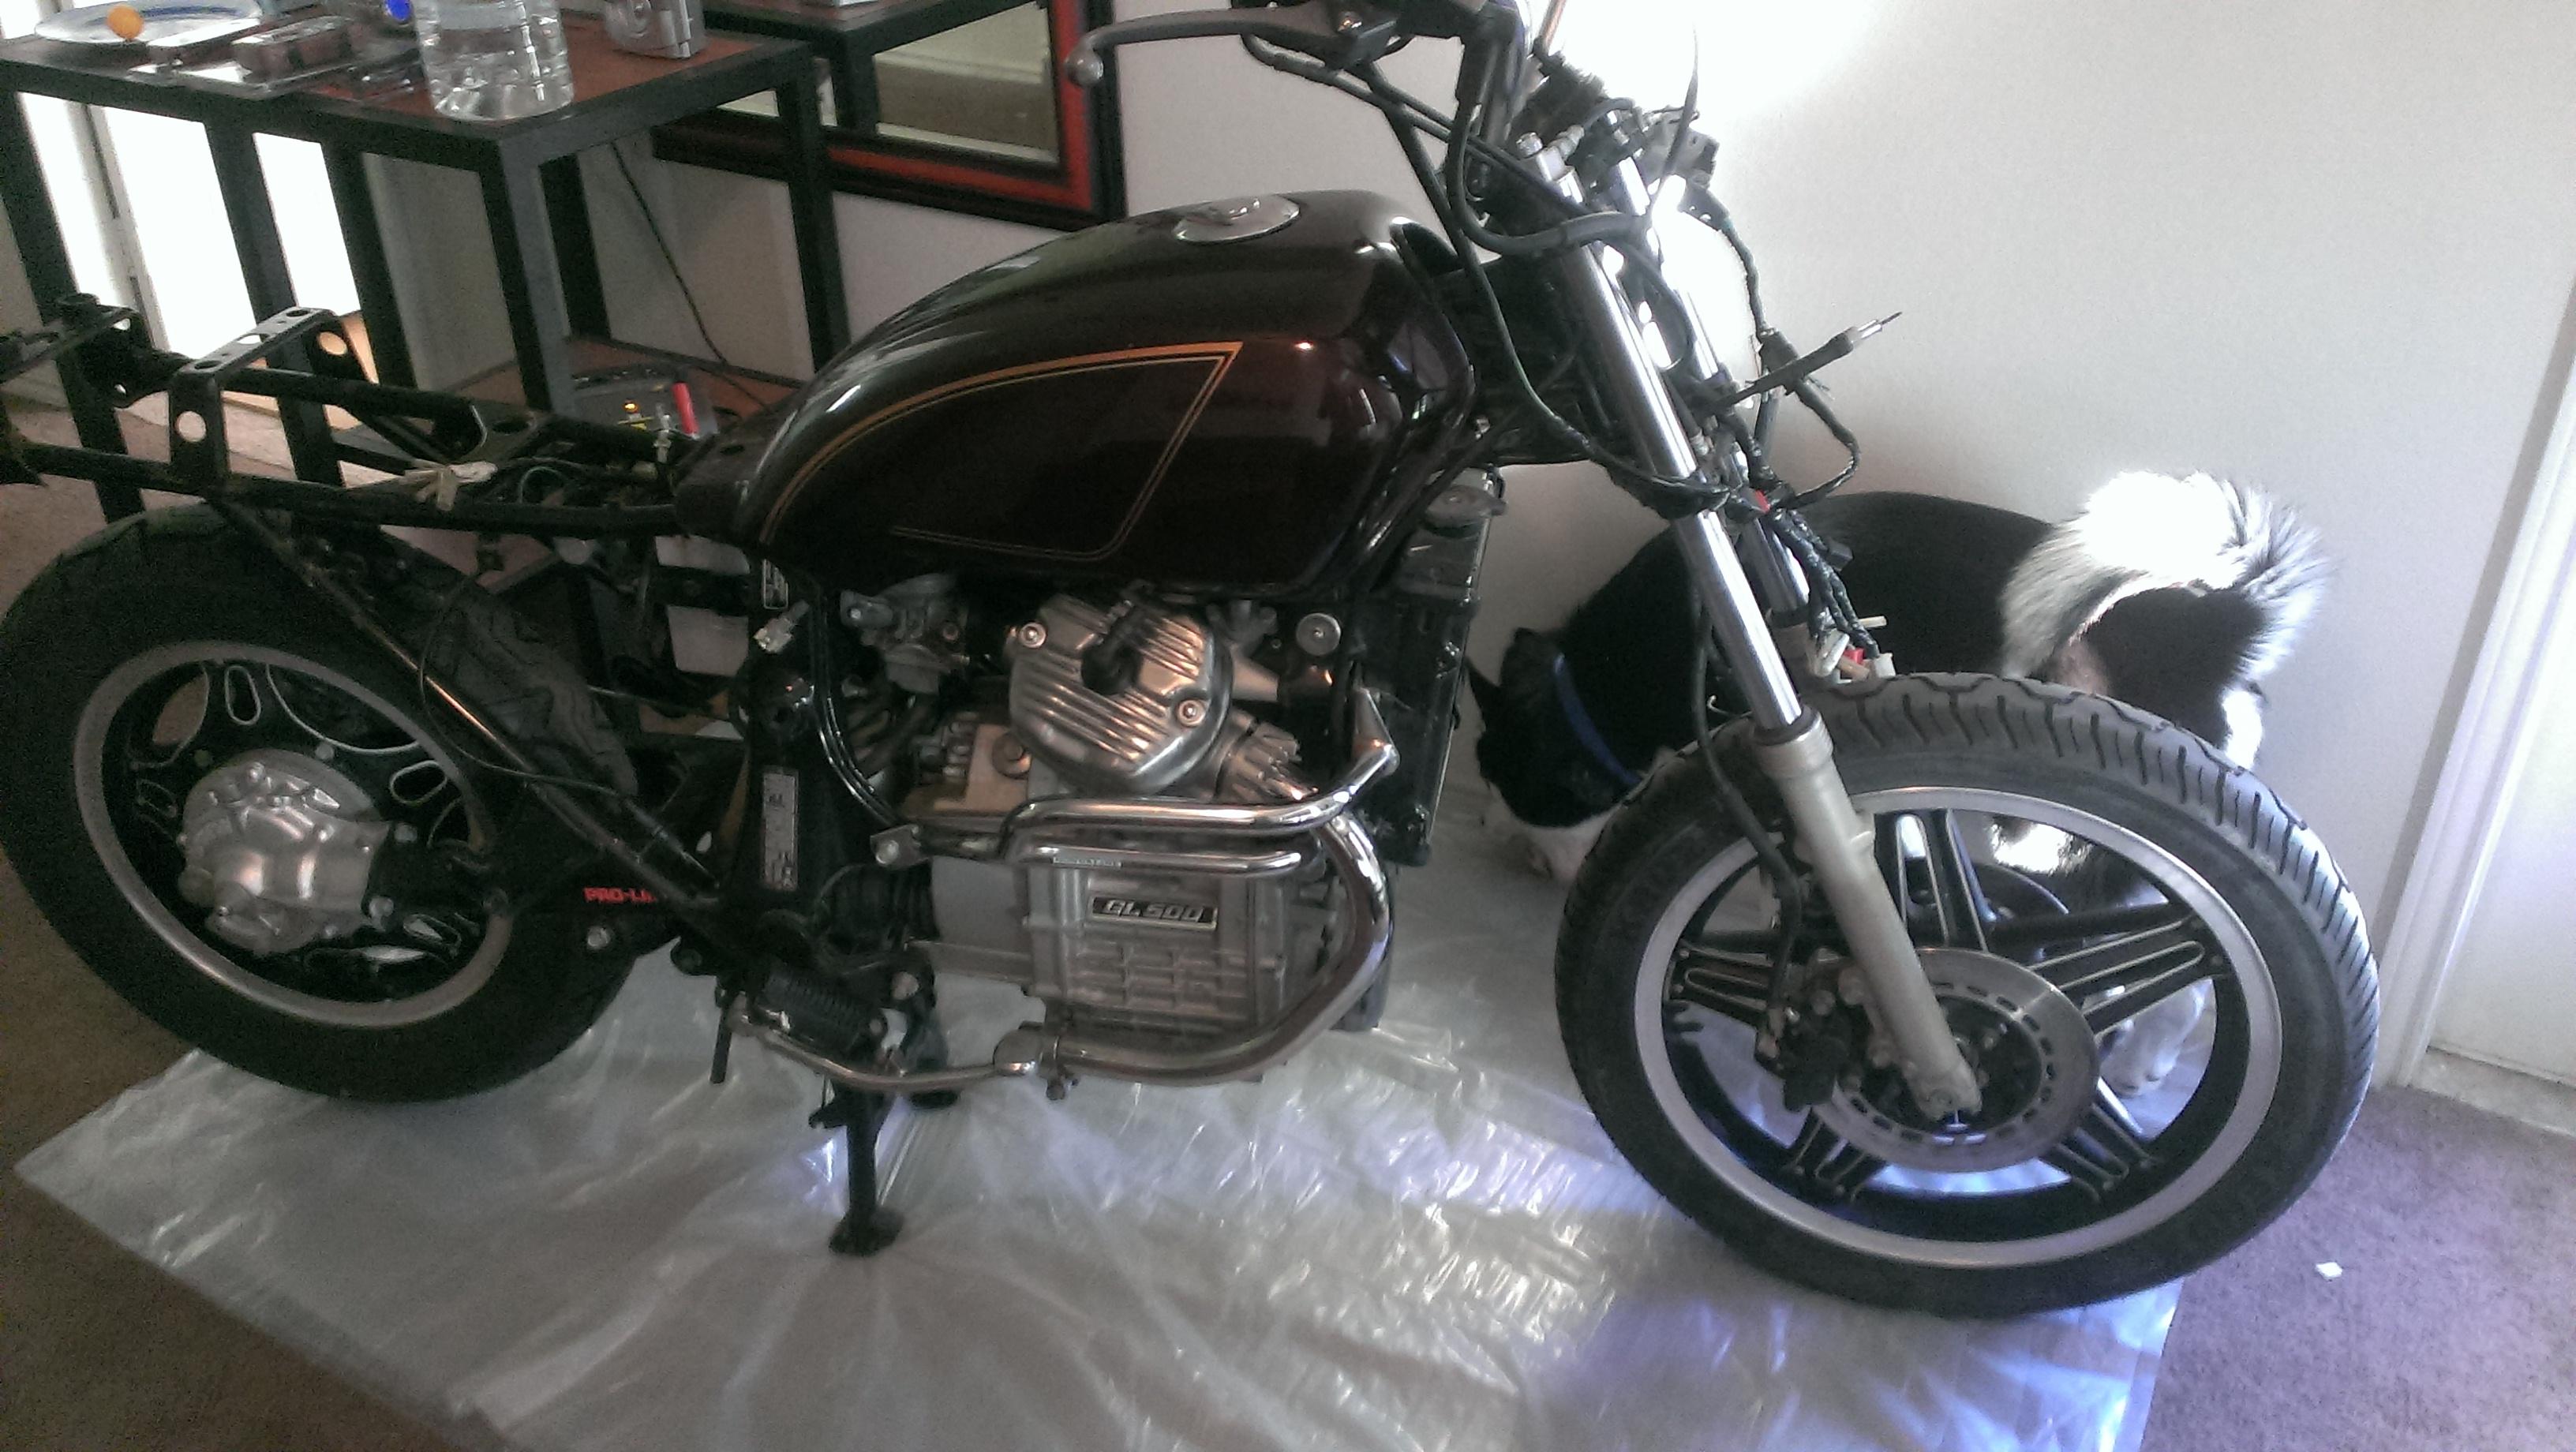 1982 Honda Gl500 Silverwing Rebuild 1970 Silver Wing Motorcycles Name Imag0957 Views 3904 Size 142 Mb